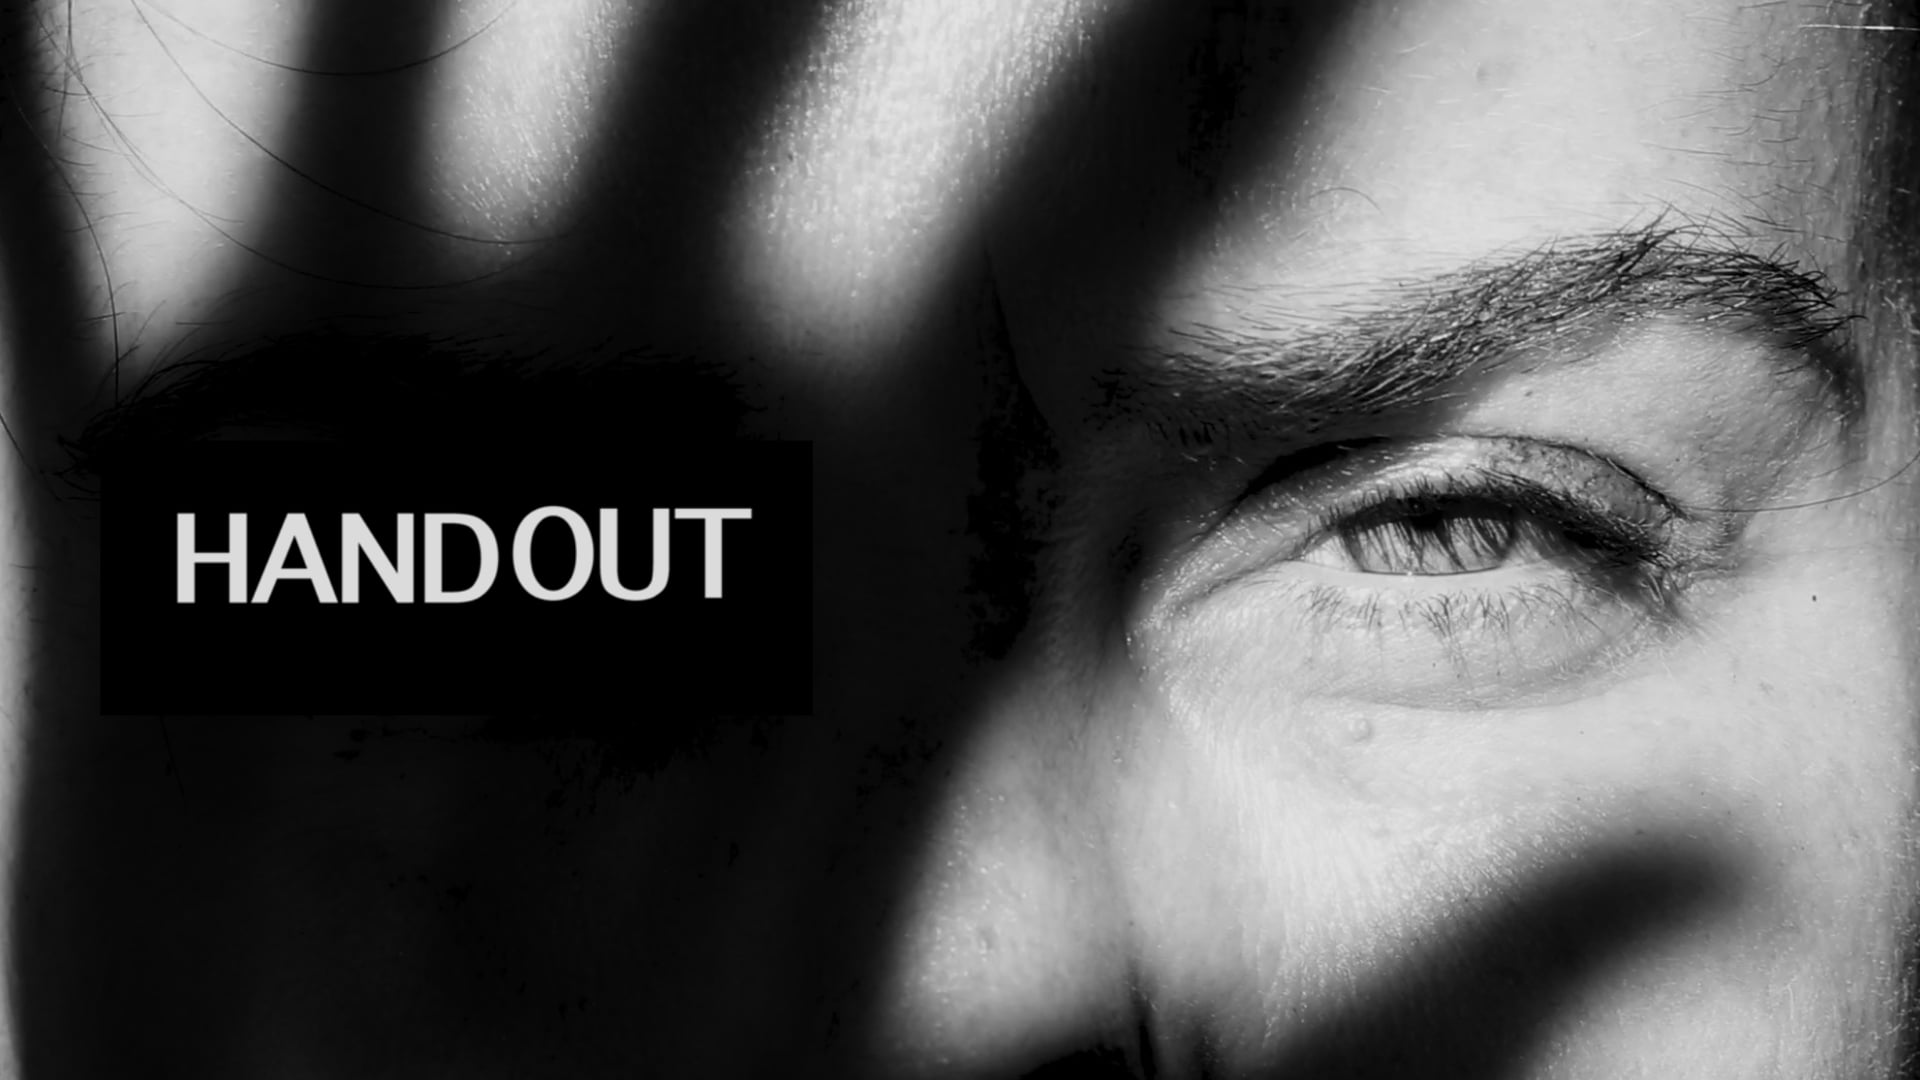 Handout | Documentary Trailer